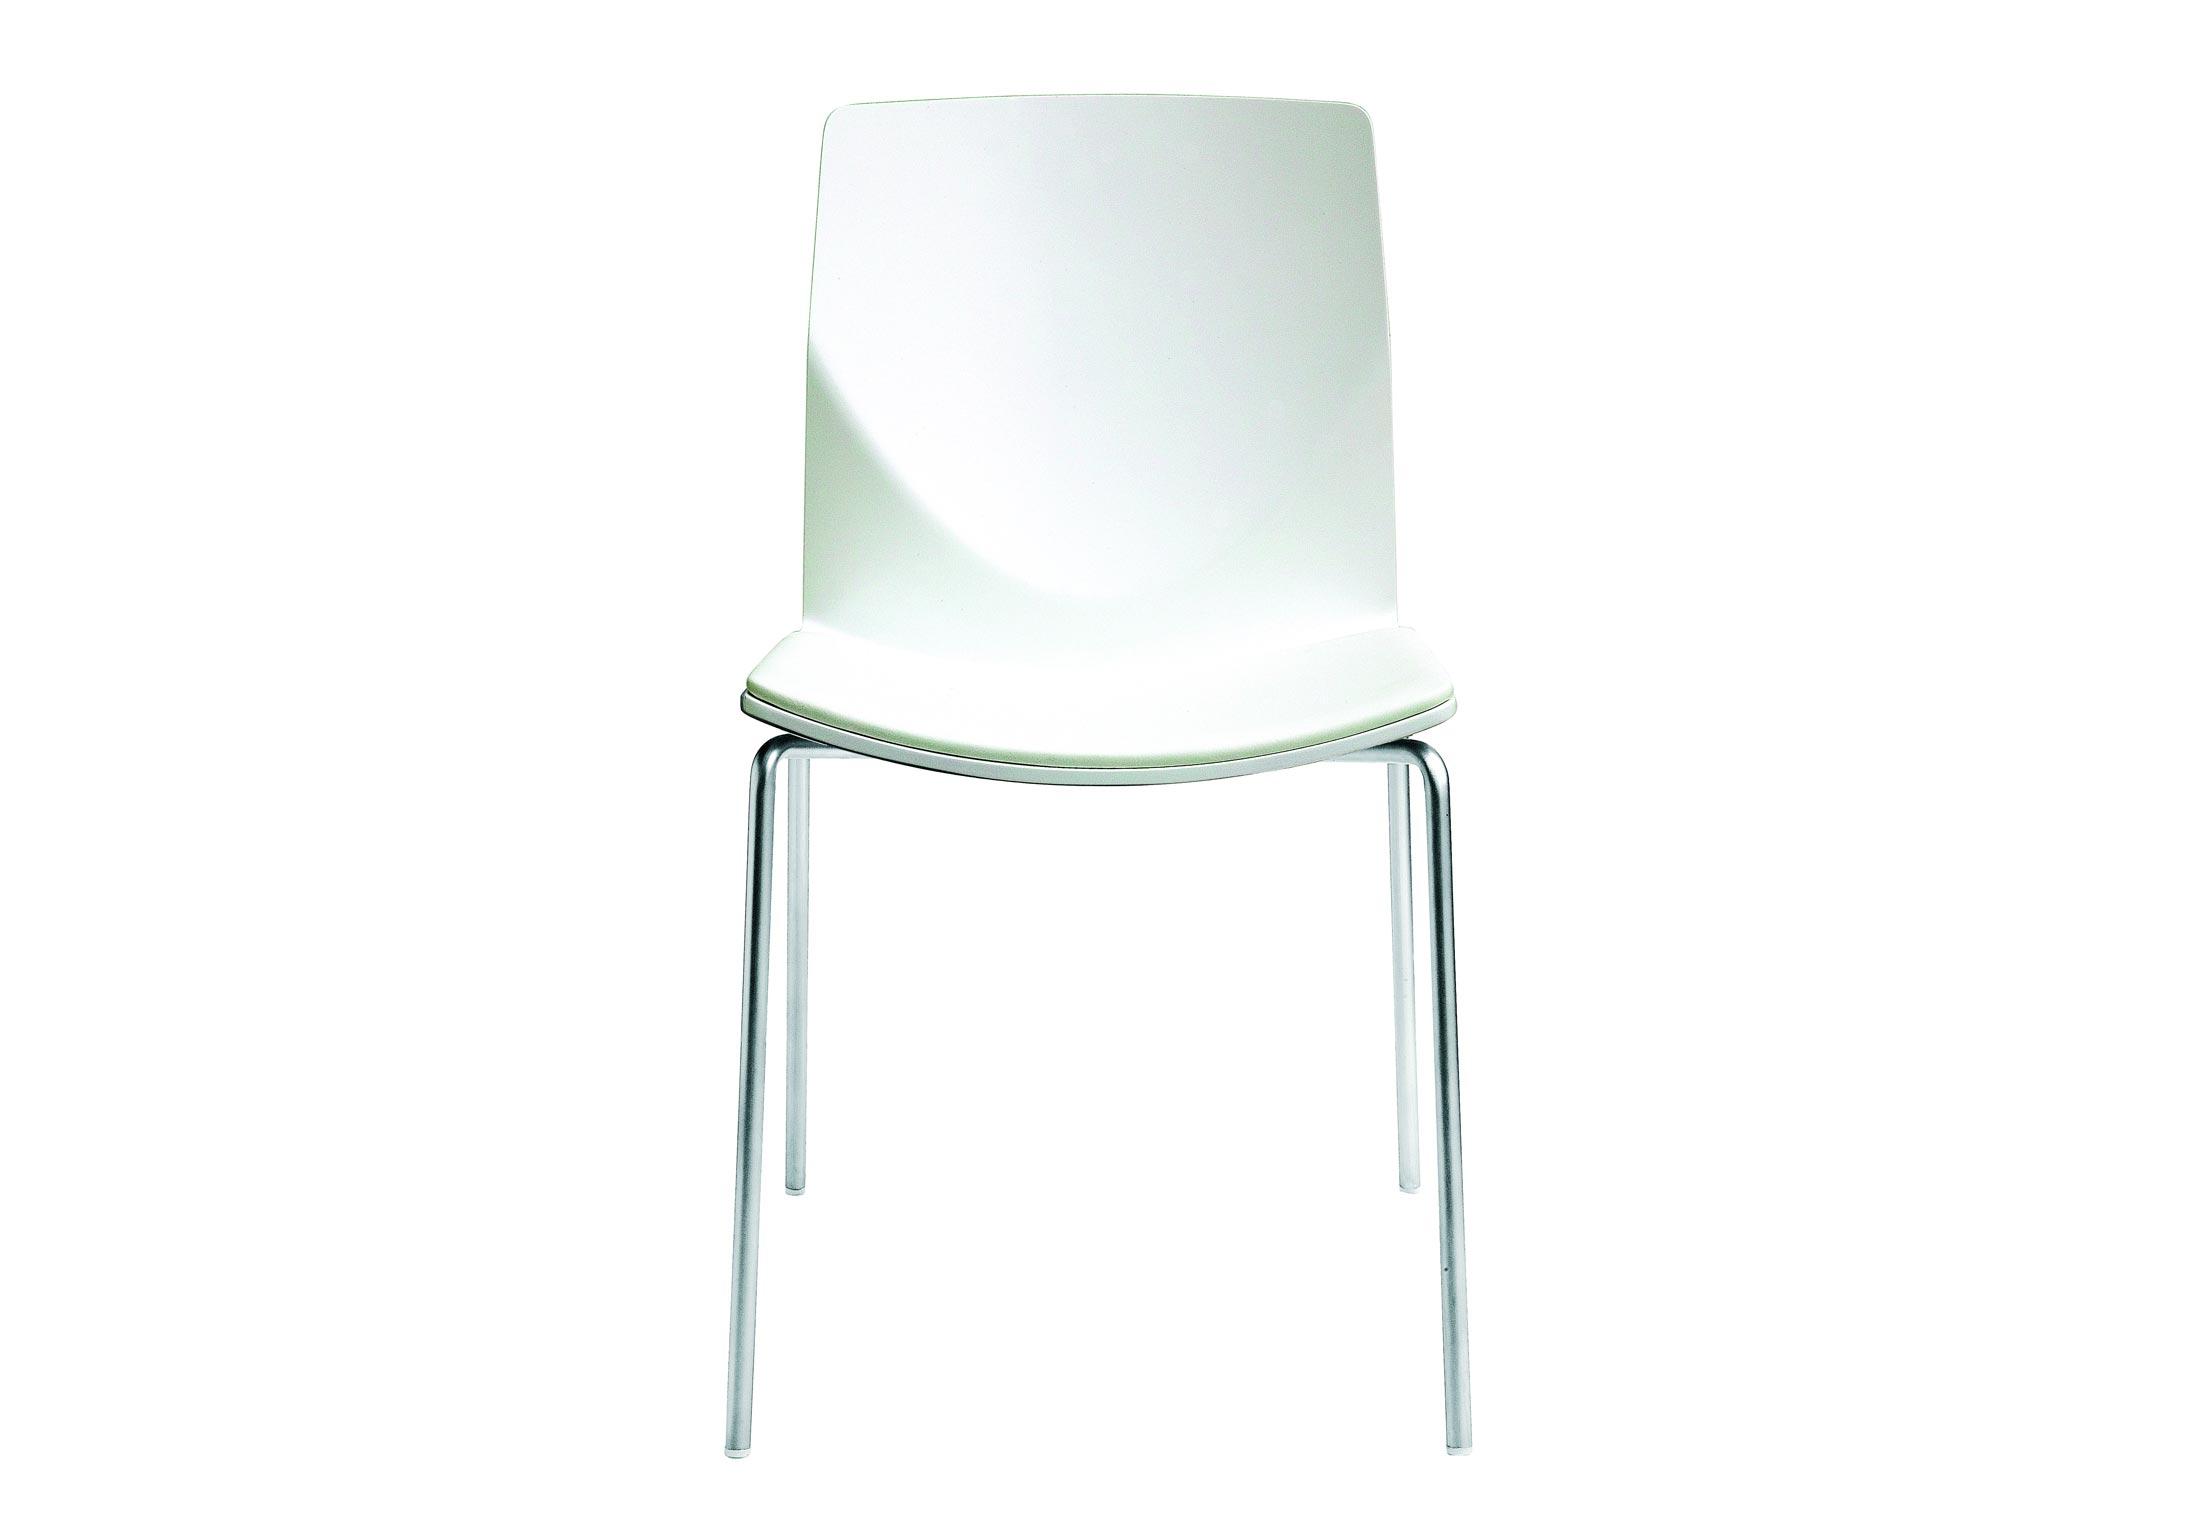 kai stuhl von lapalma stylepark. Black Bedroom Furniture Sets. Home Design Ideas